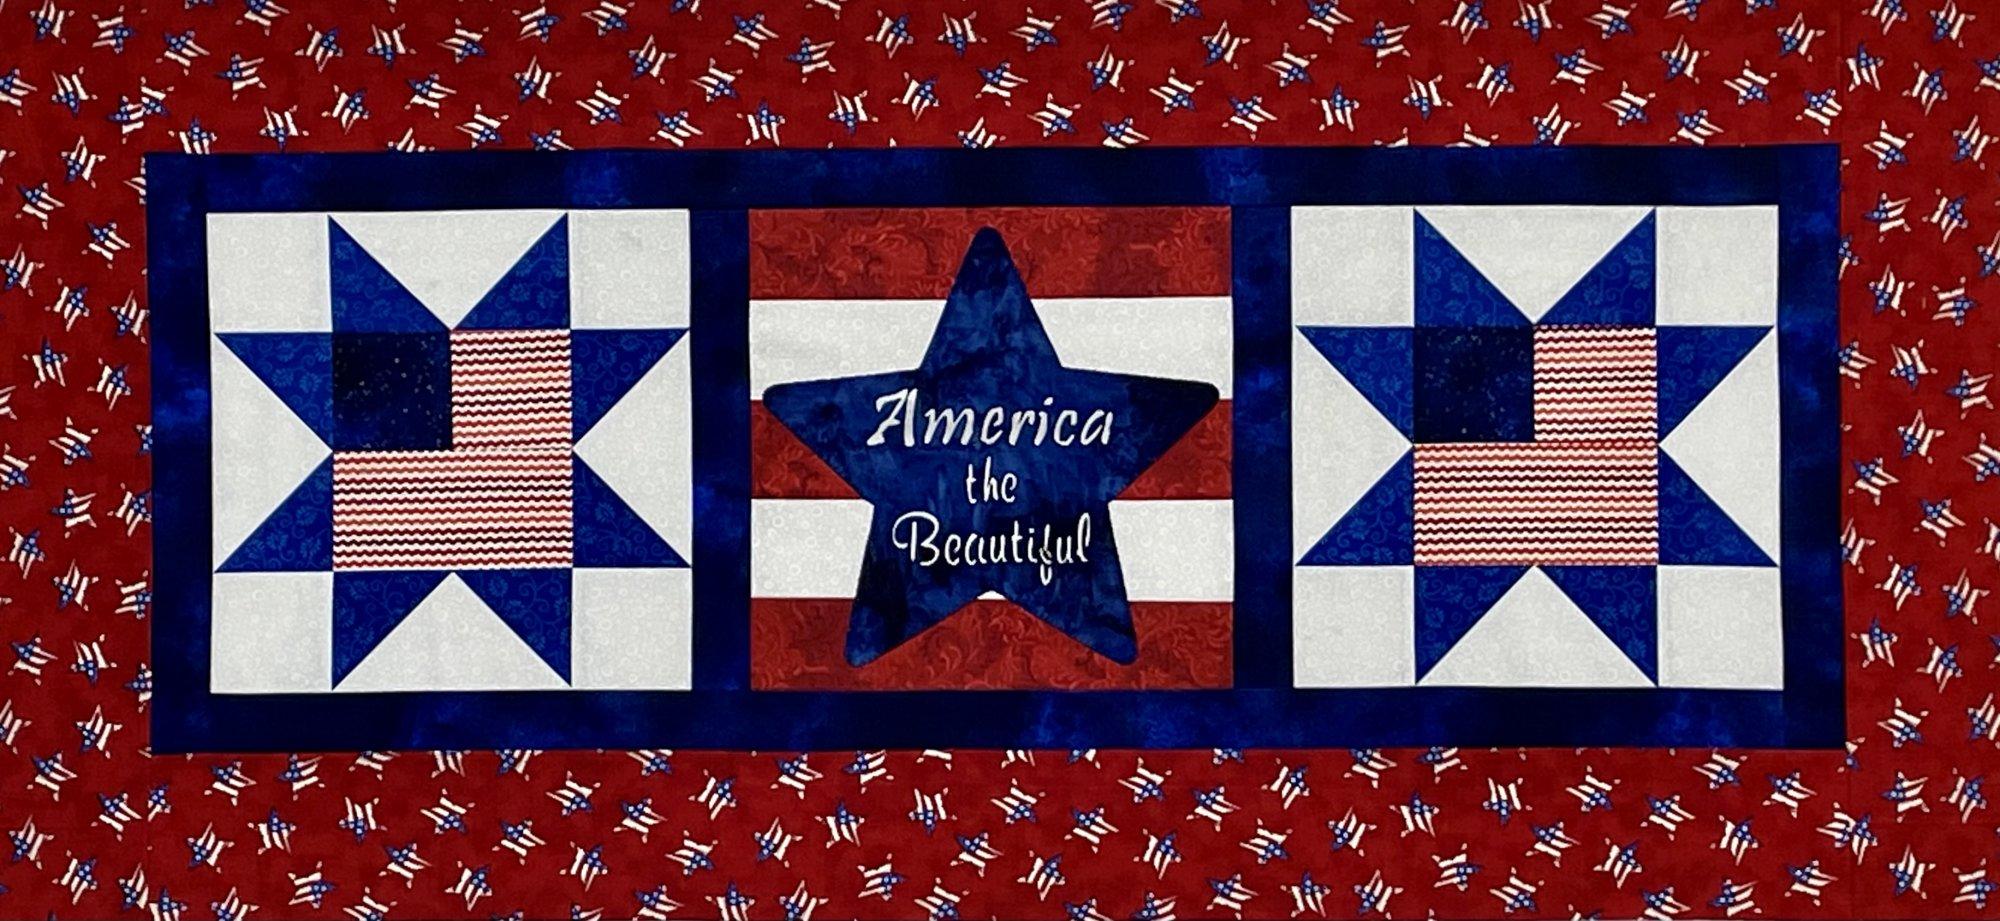 America the Beautiful Table runner